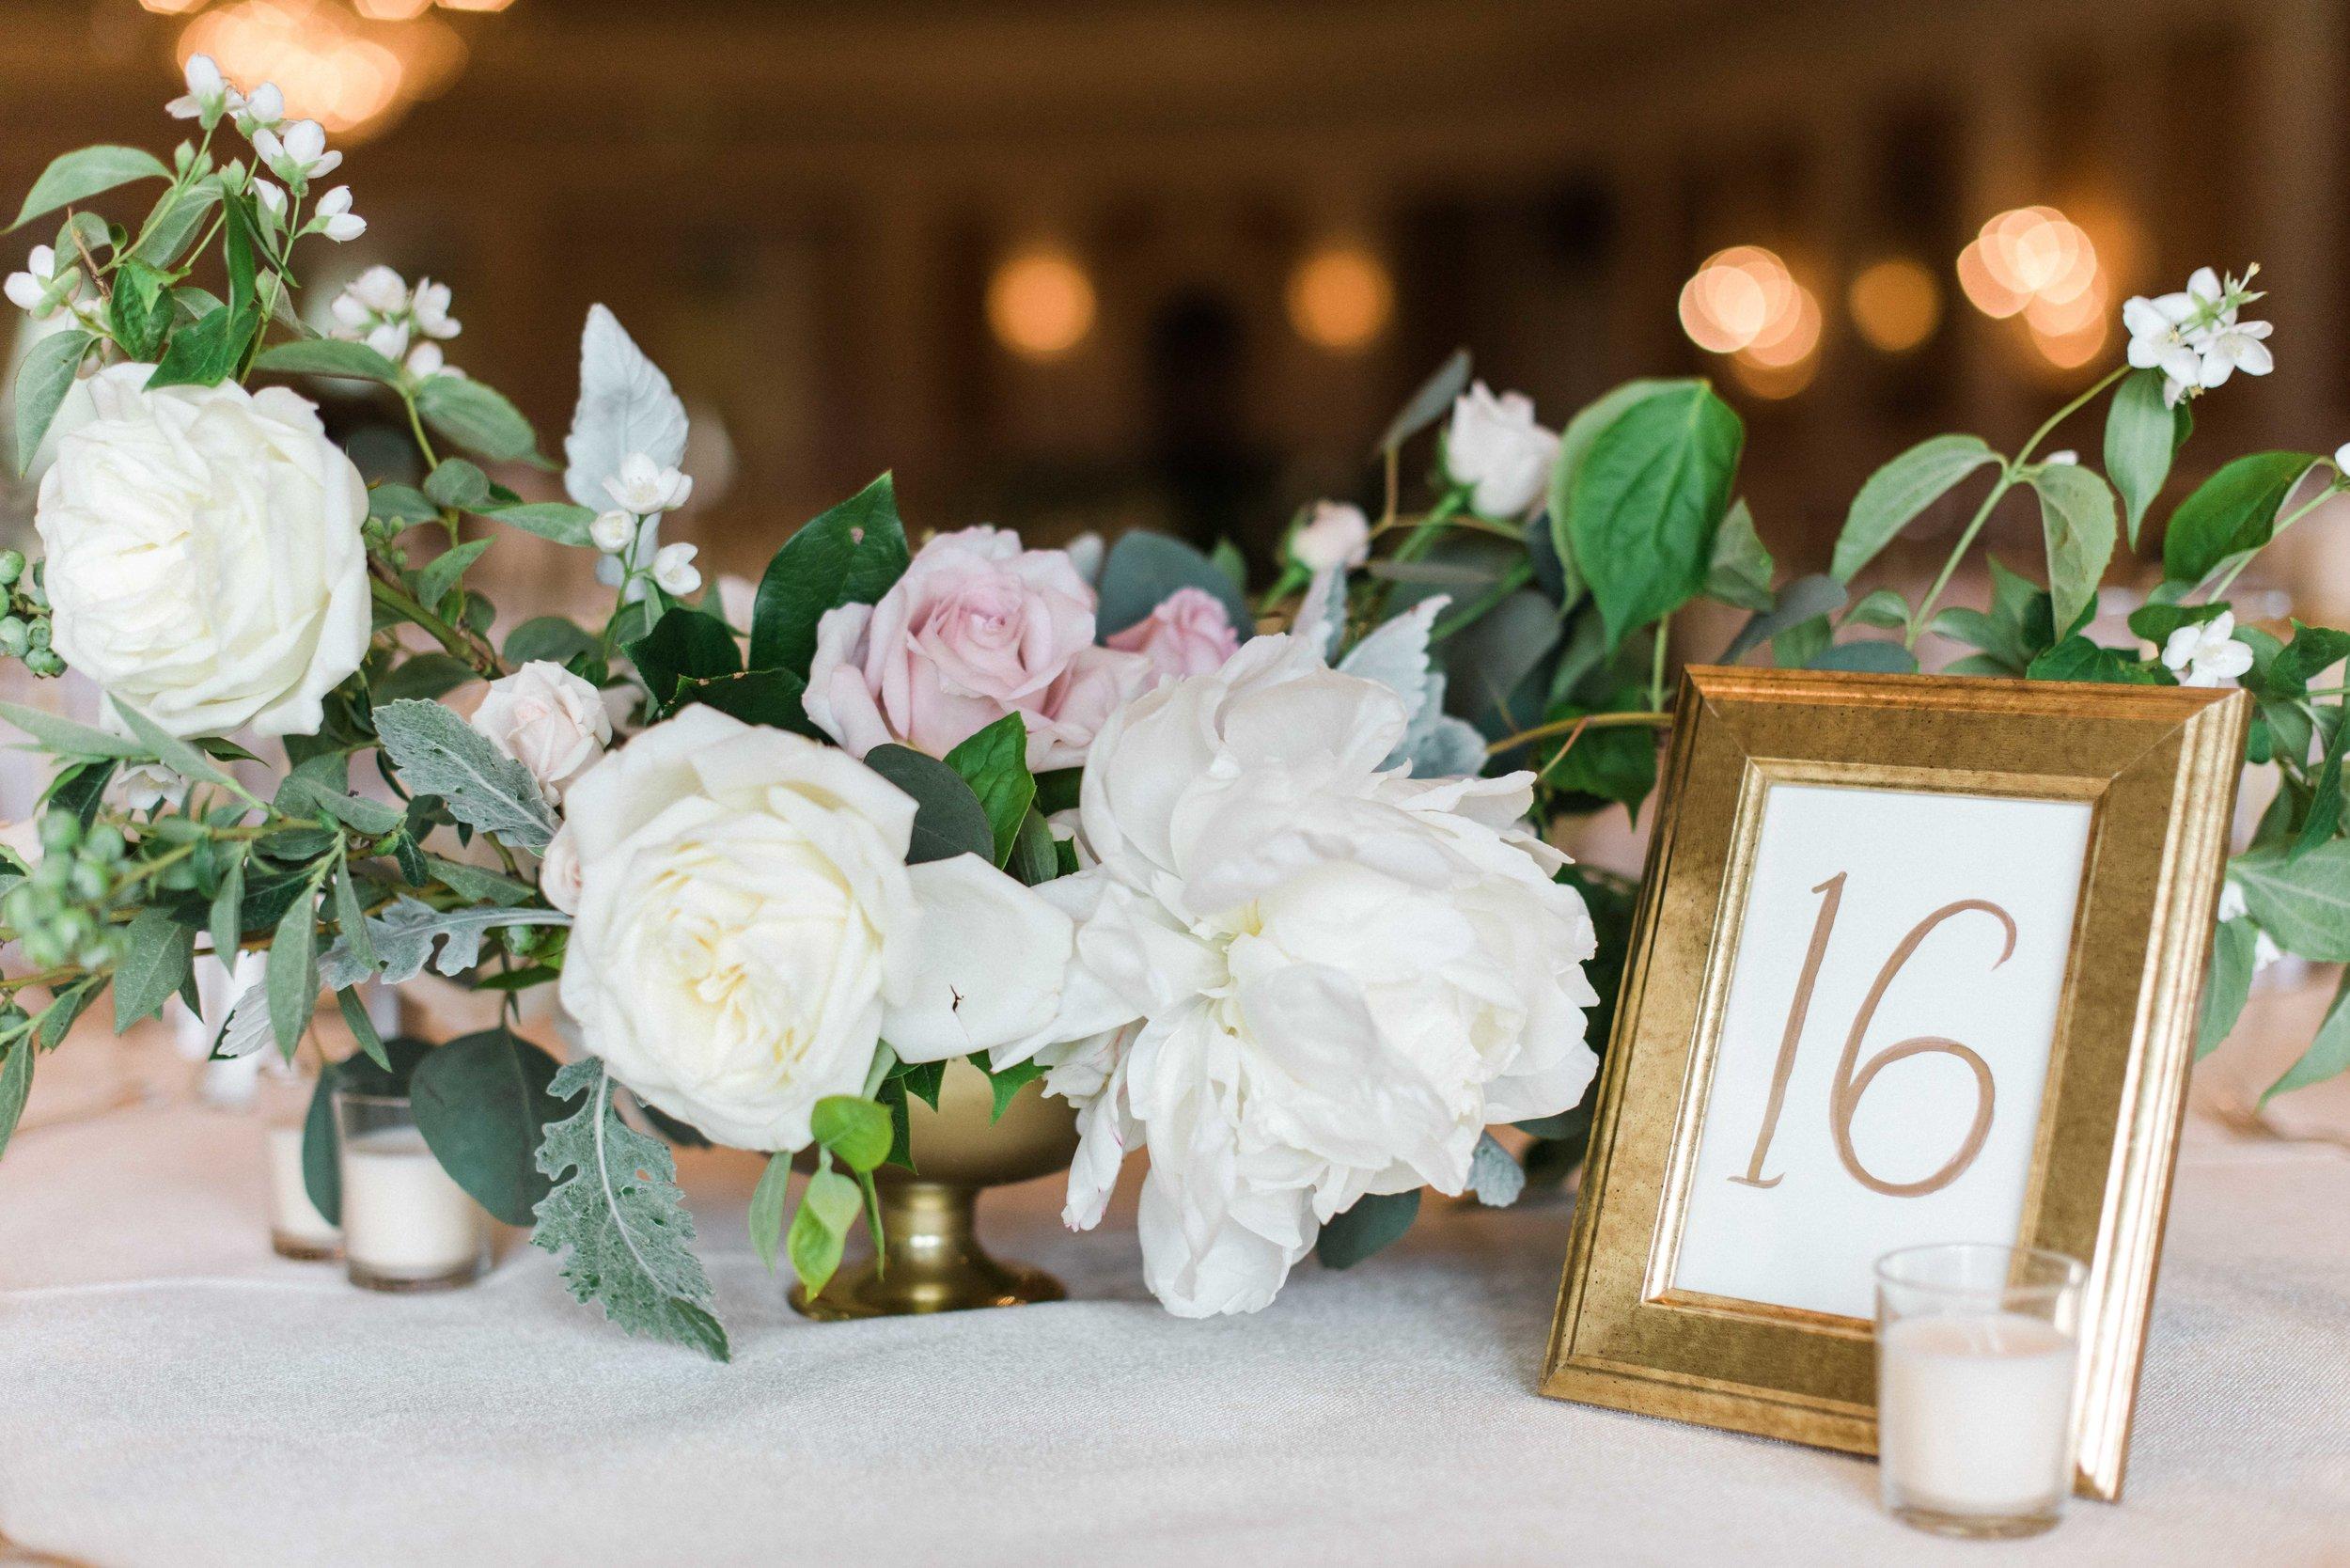 Fine-Art-Film-Houston-Wedding-Photographer-Best-Top-Luxury-Texas-Austin-Dallas-Destination-Dana-Fernandez-Photography-River-Oaks-Country-Club-South-Main-Baptist-Ceremony-Reception-Wedding-14.jpg